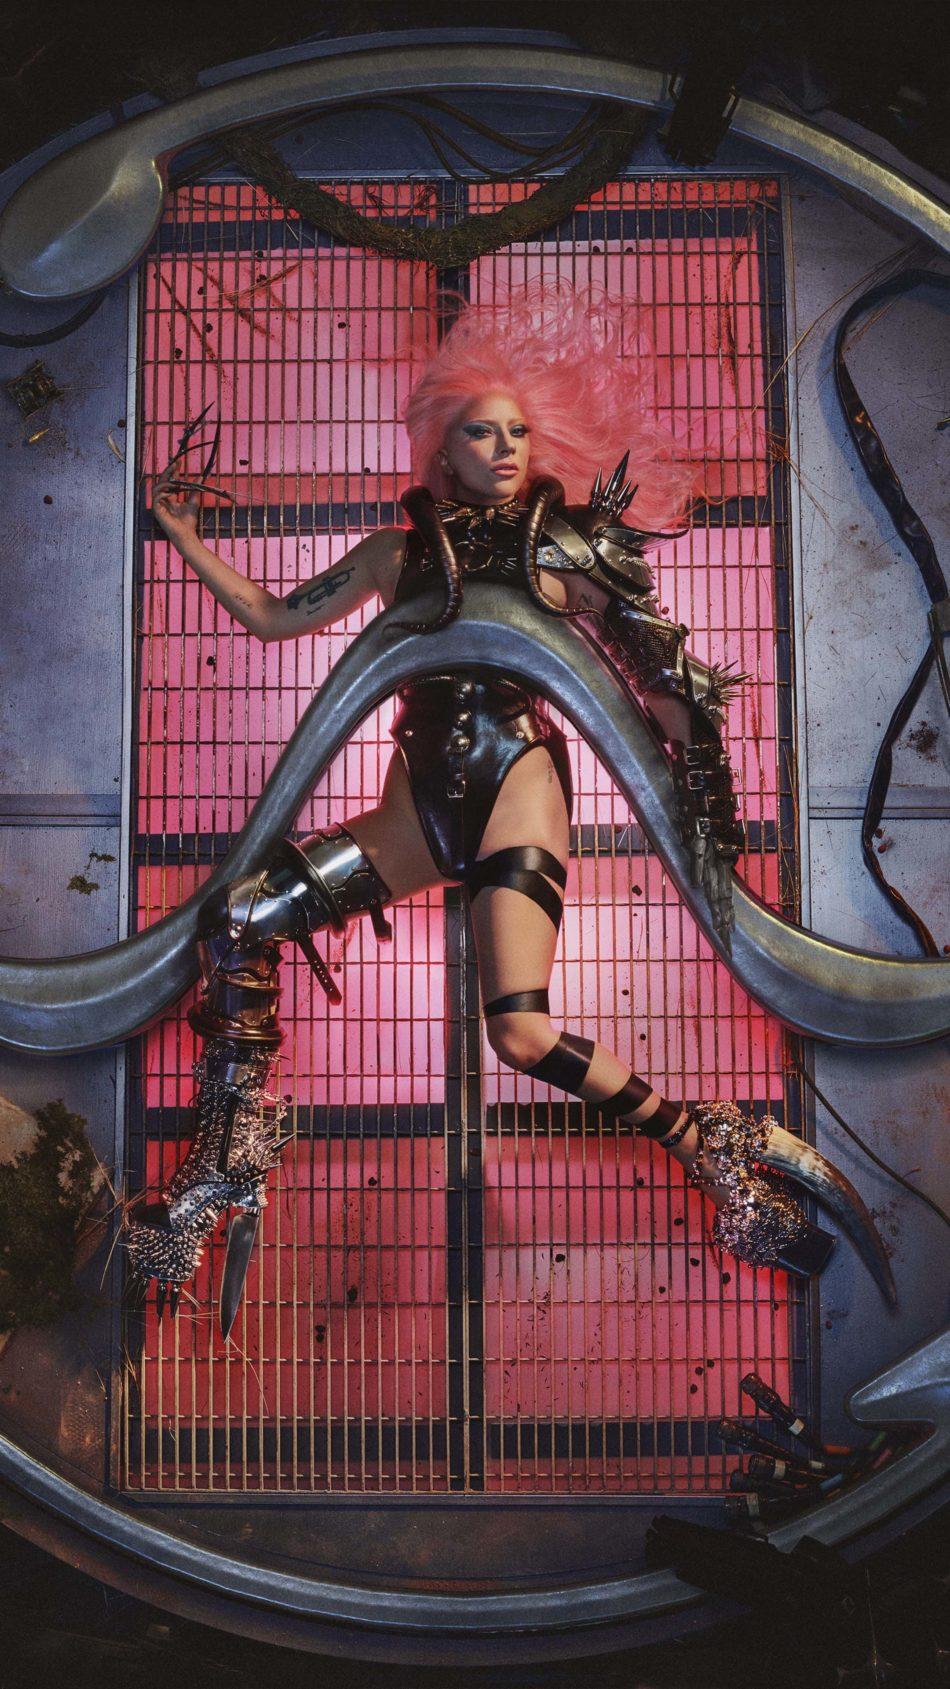 Lady Gaga Chromatica Photoshoot 4K Ultra HD Mobile Wallpaper